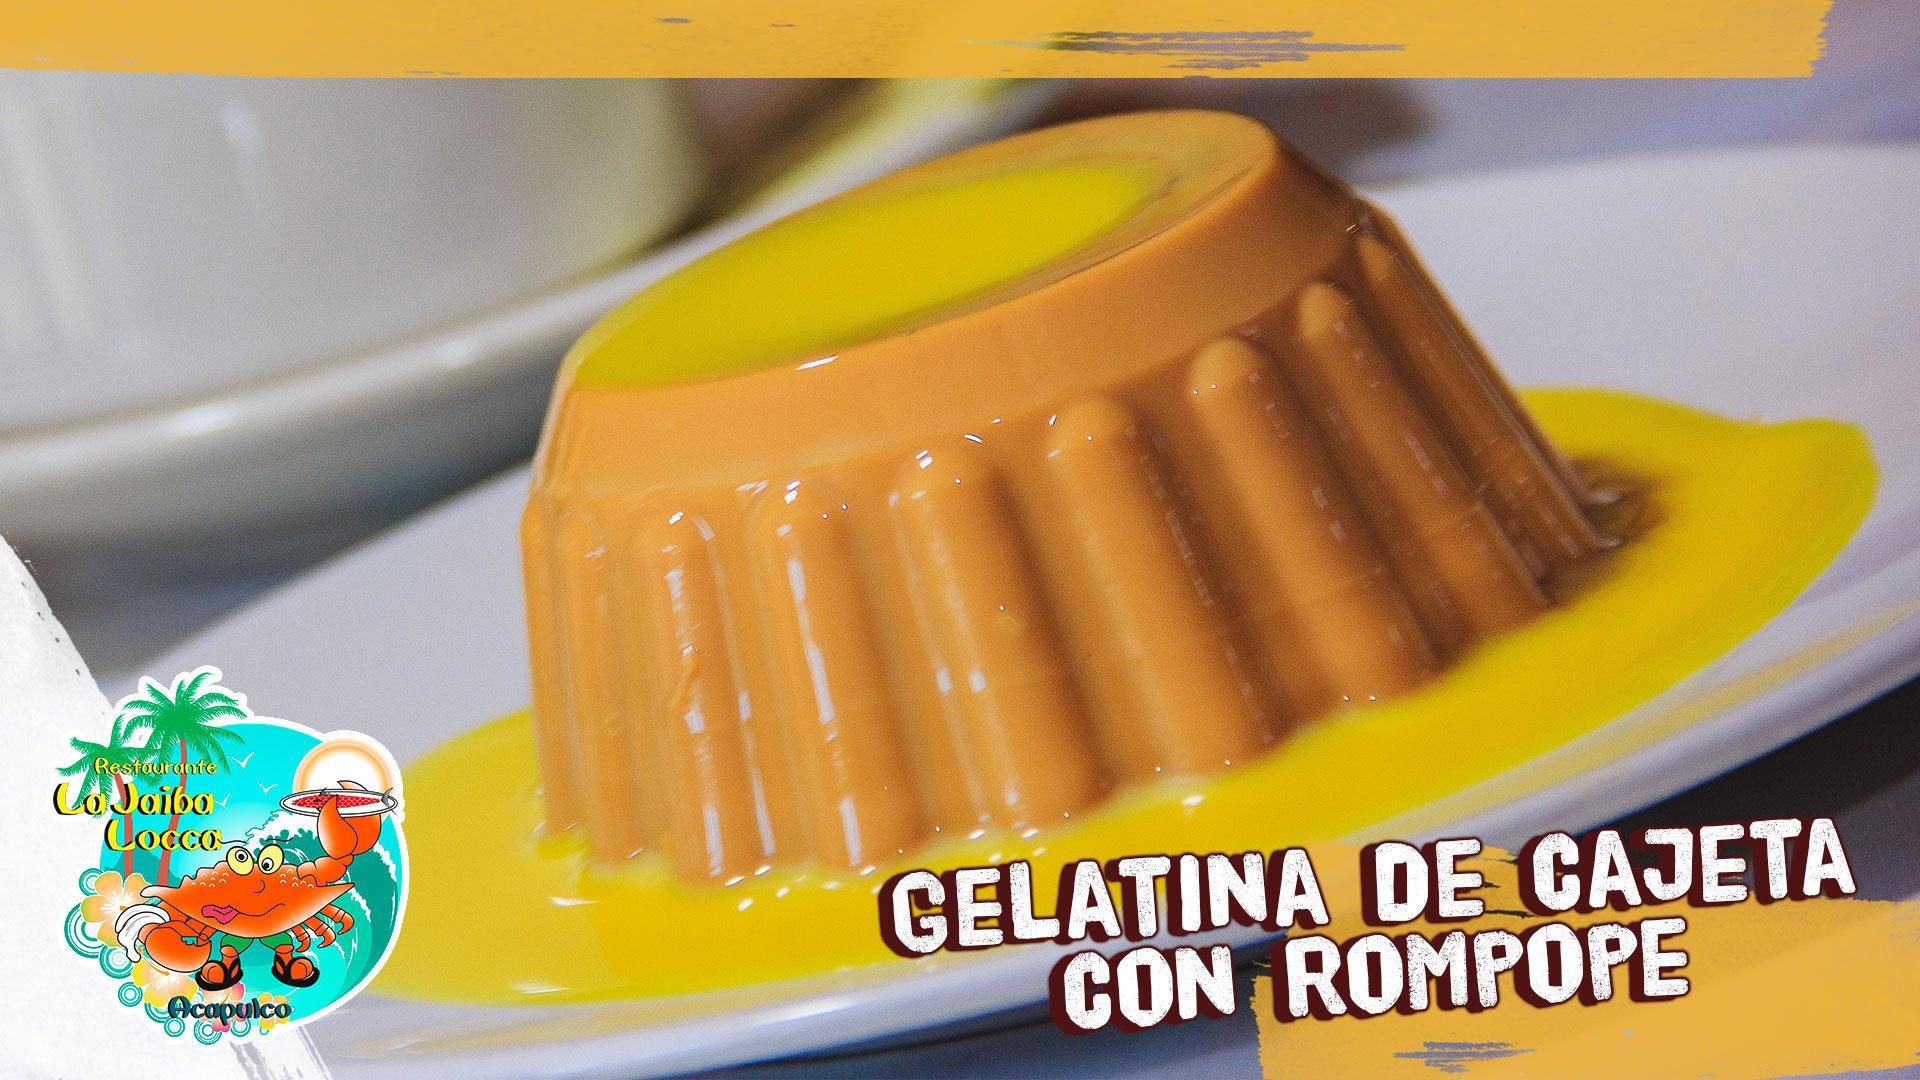 https://0201.nccdn.net/4_2/000/000/057/fca/49-Gelatina-de-Cajeta-con-rompope.jpg